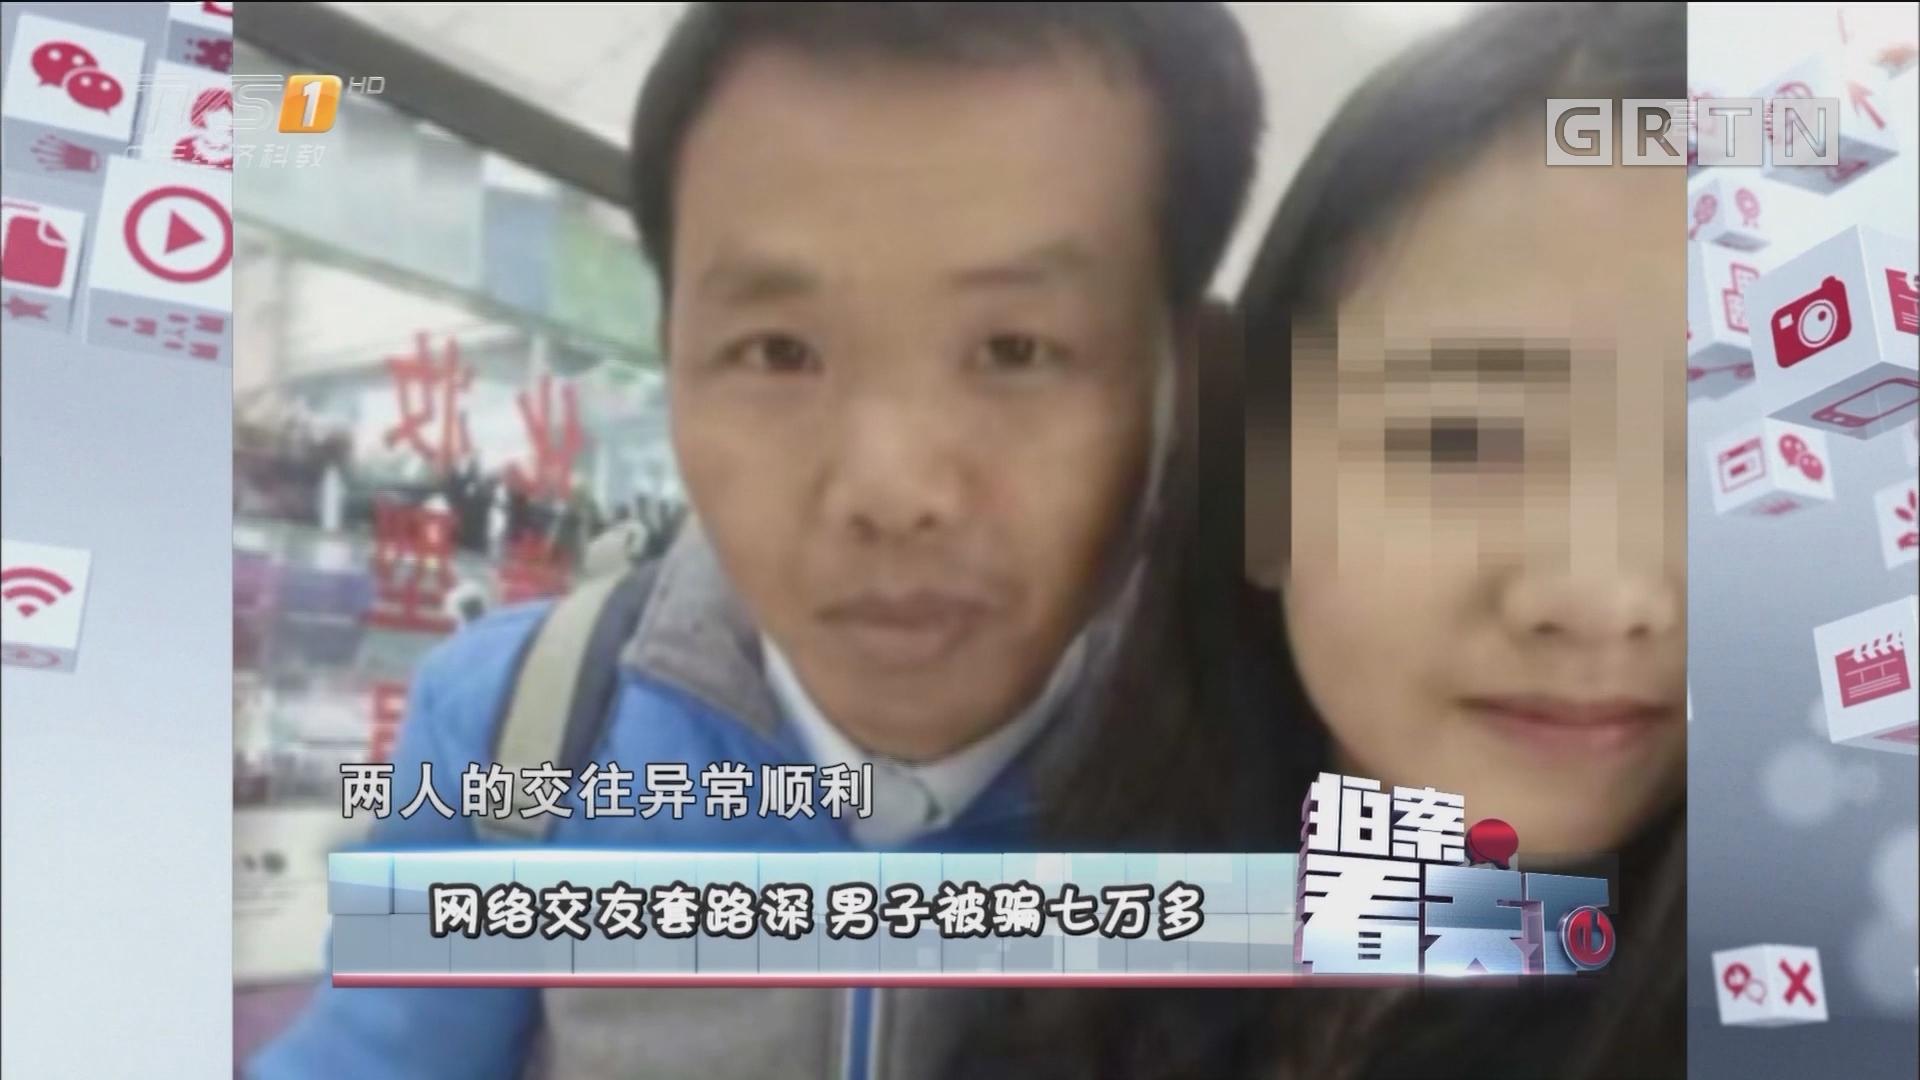 [HD][2017-08-16]拍案看天下:网络交友套路深 男子被骗七万多